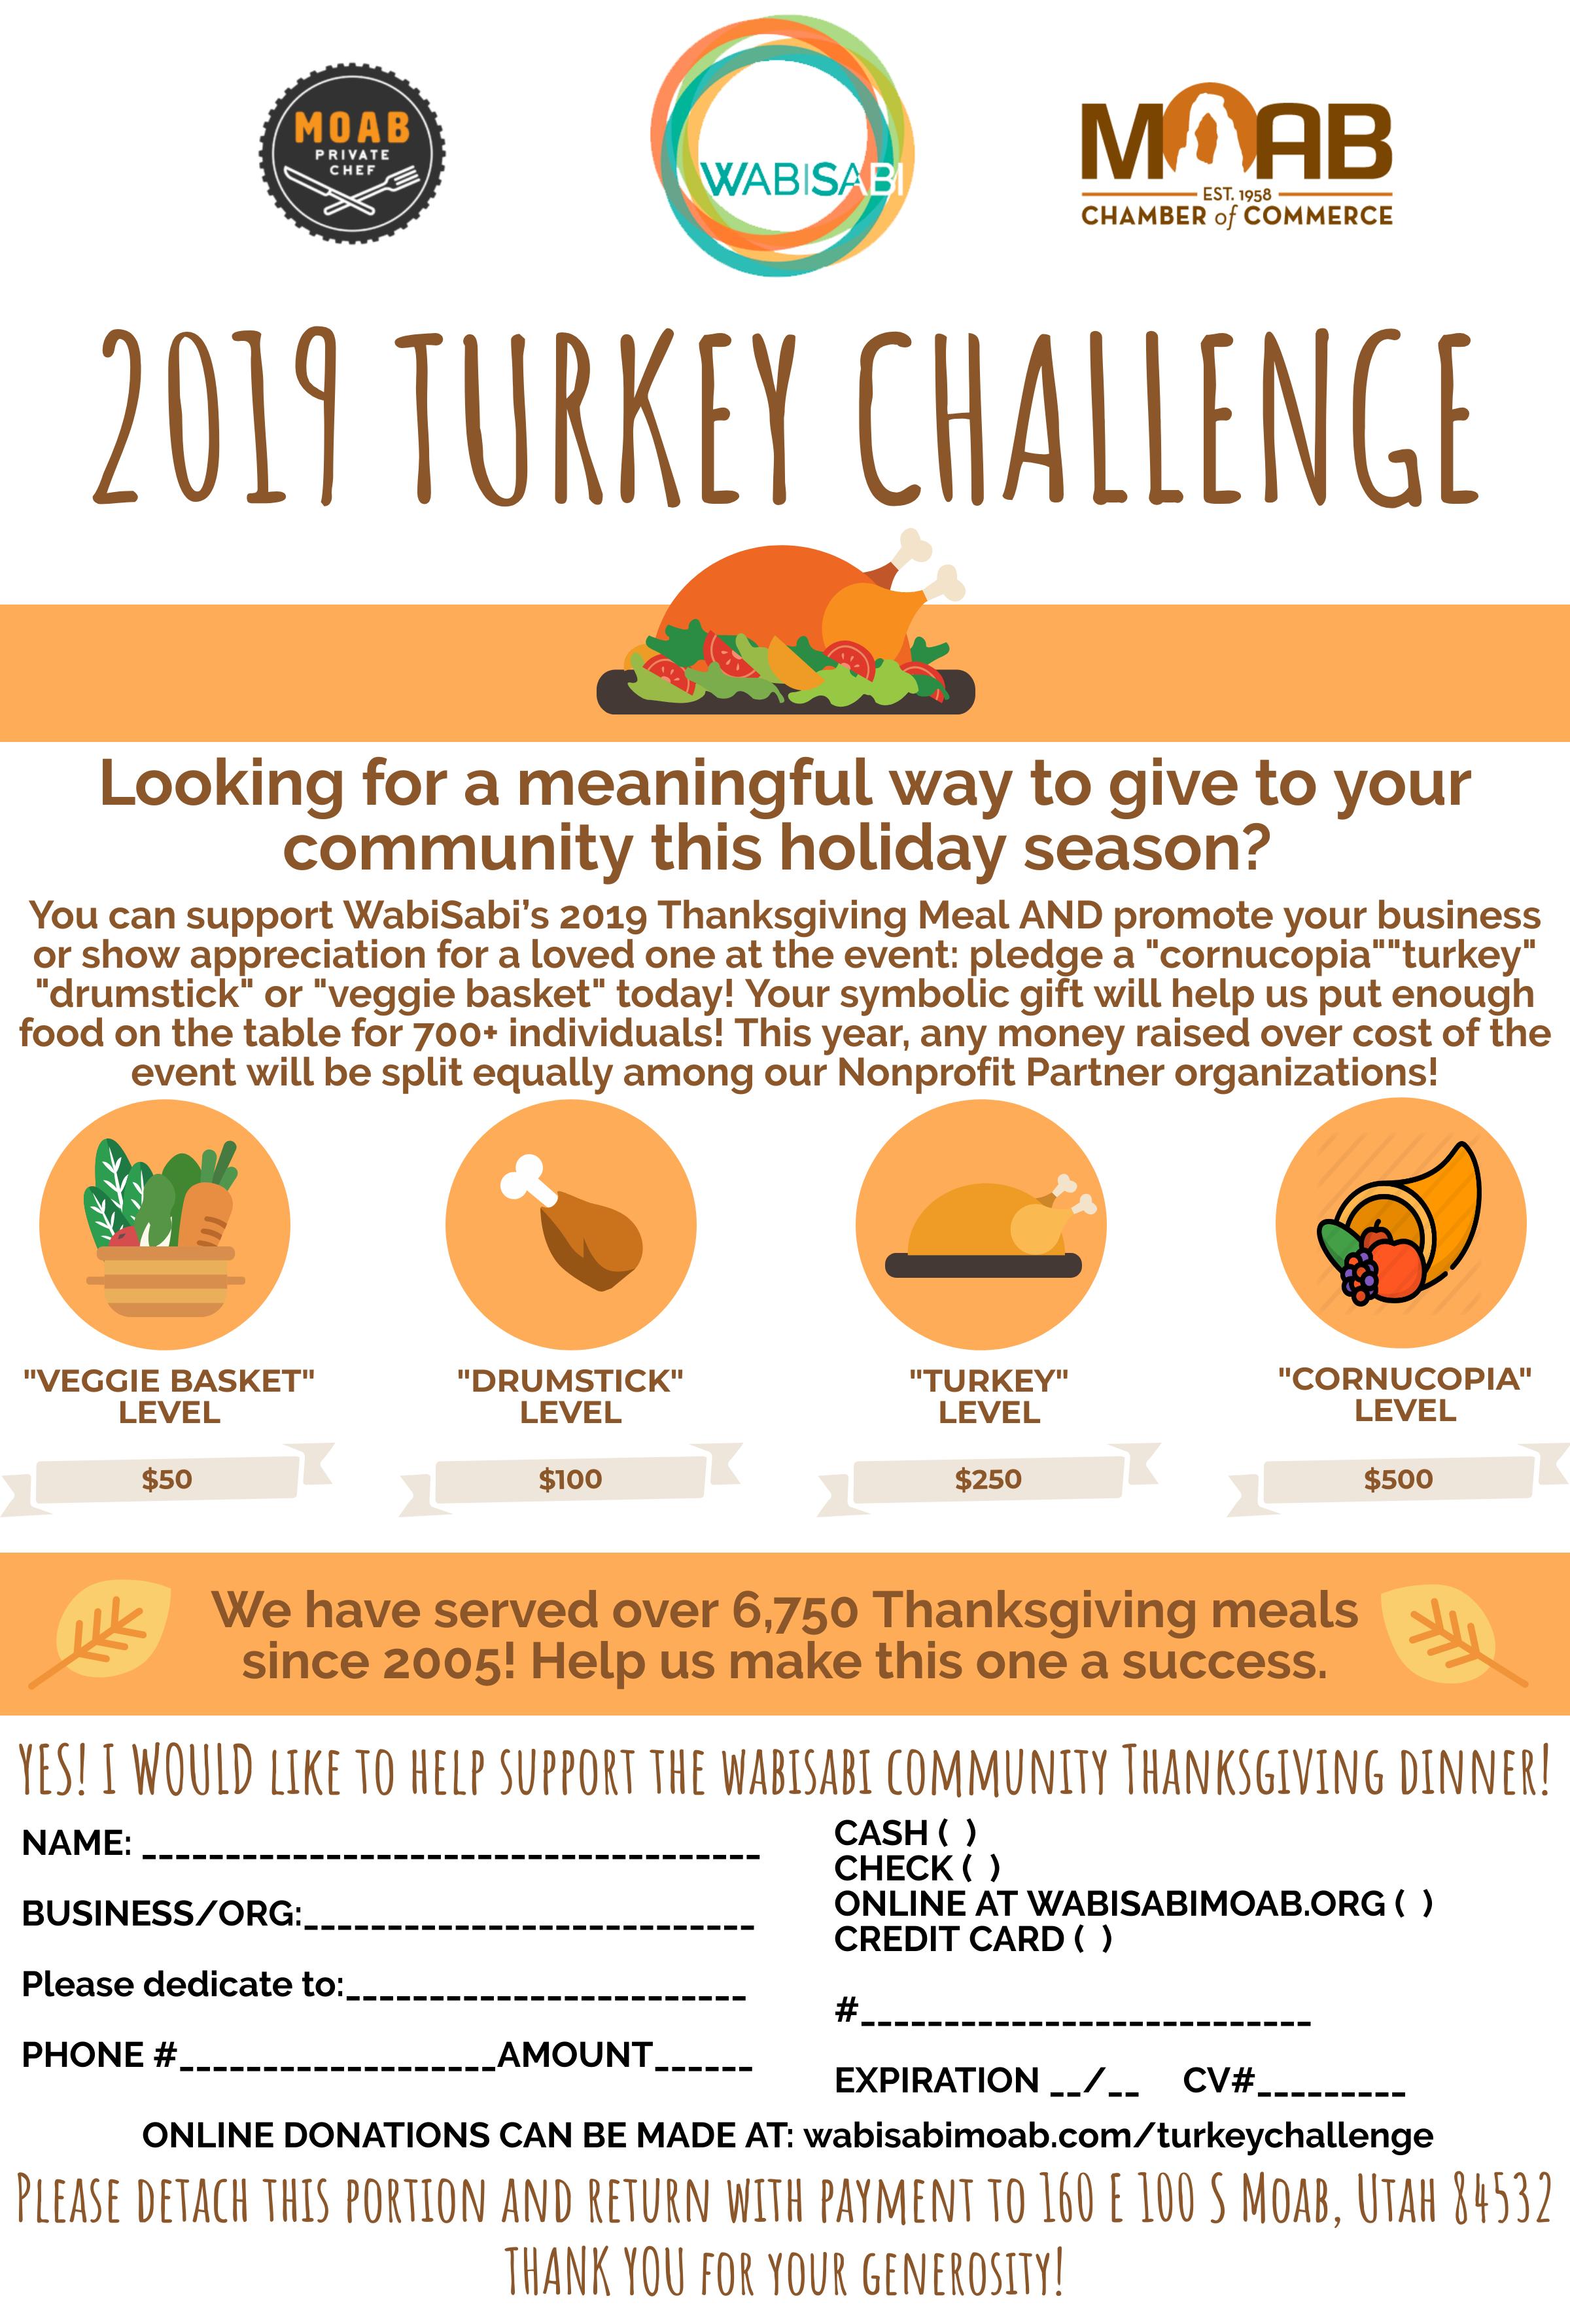 turkey-5c-20cha_32903033 (1).png